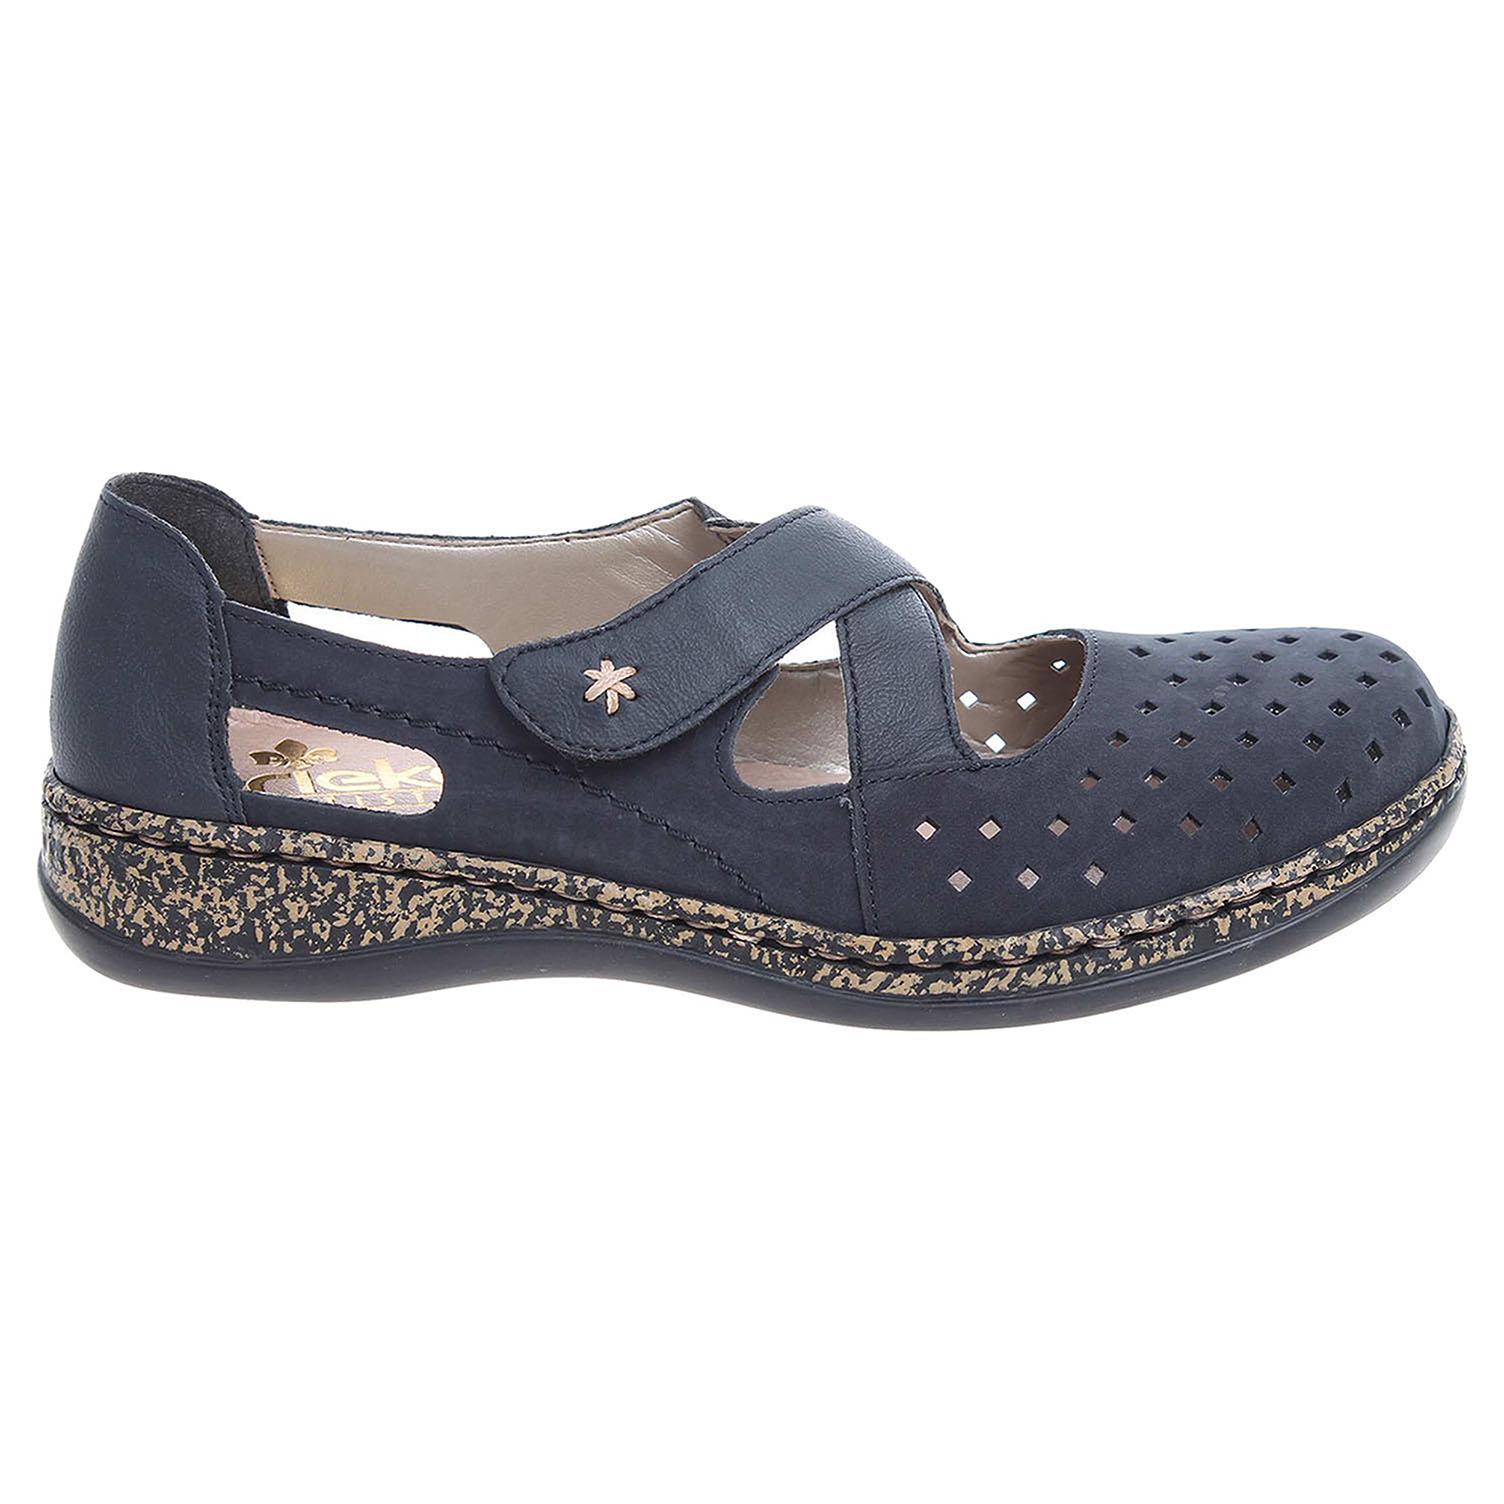 Rieker dámské sandály 46345-14 modré 37